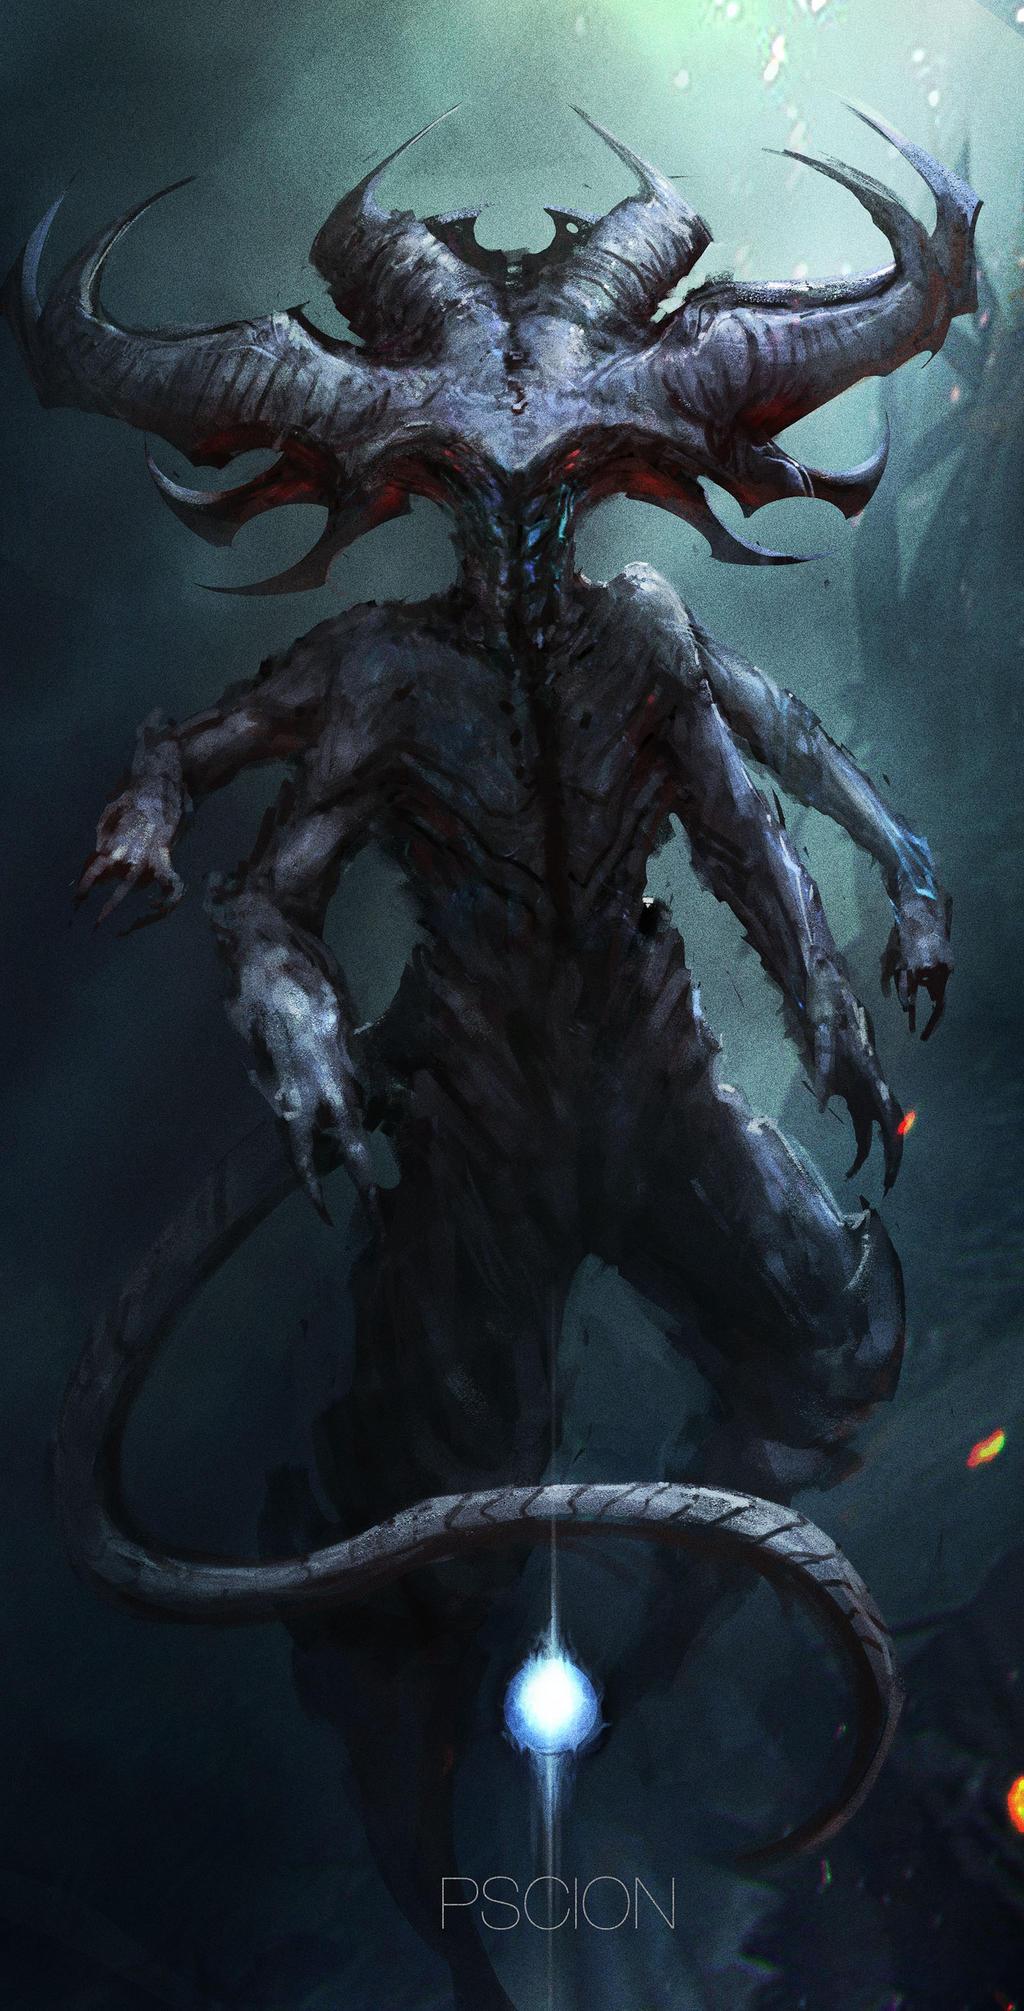 Pscion by Darkcloud013